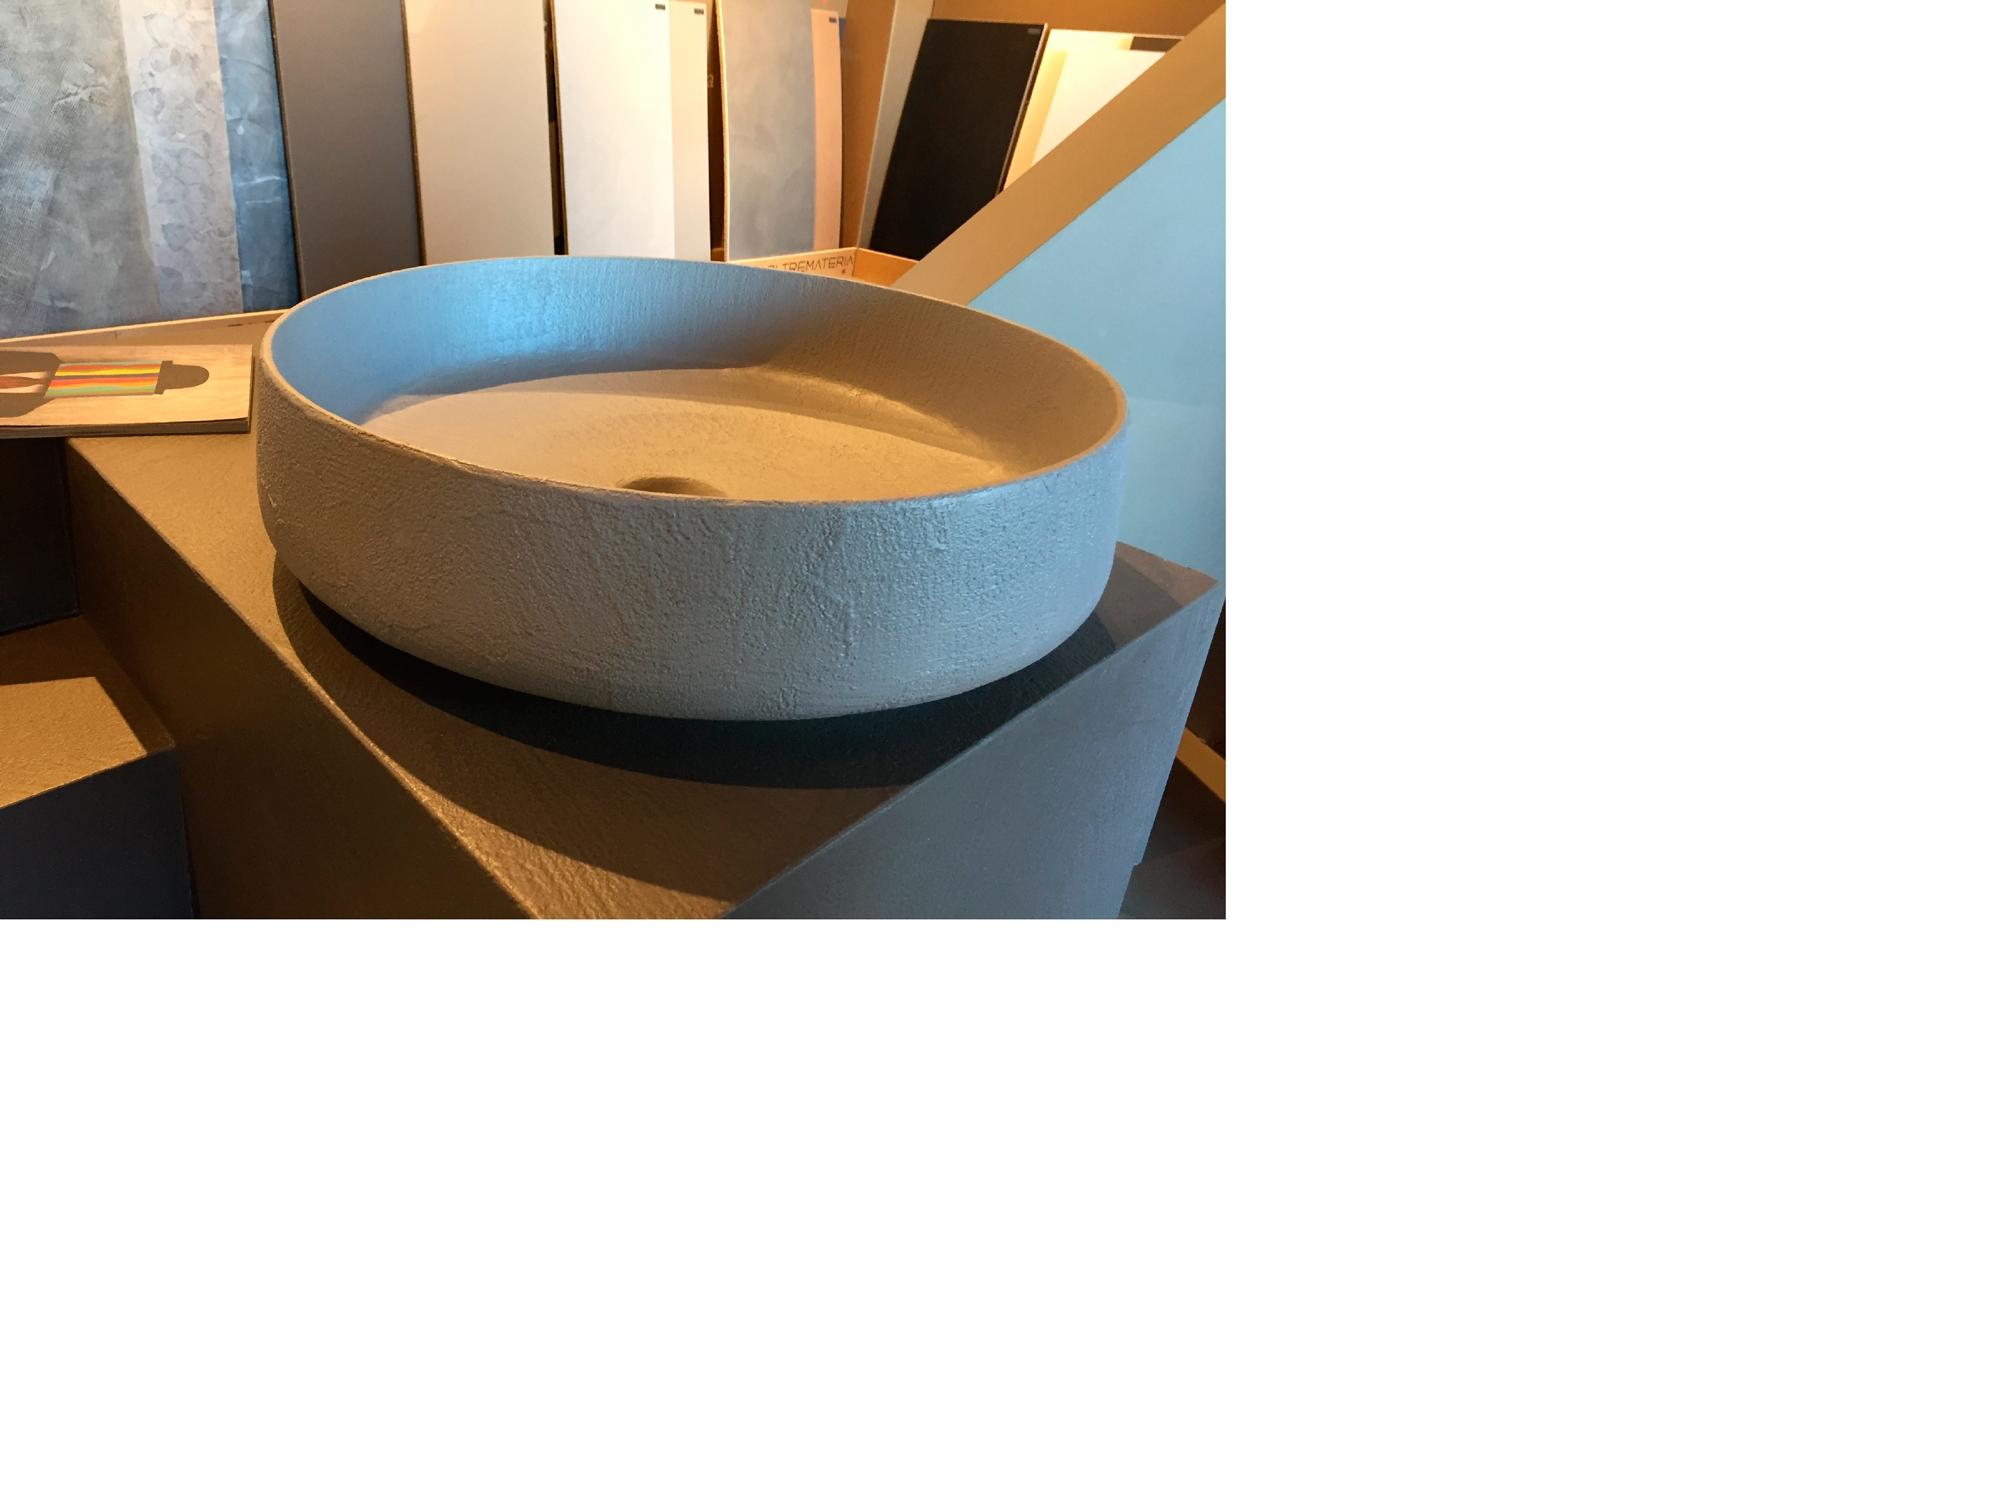 Porte ingresso leroy merlin for Lavatoio ceramica leroy merlin